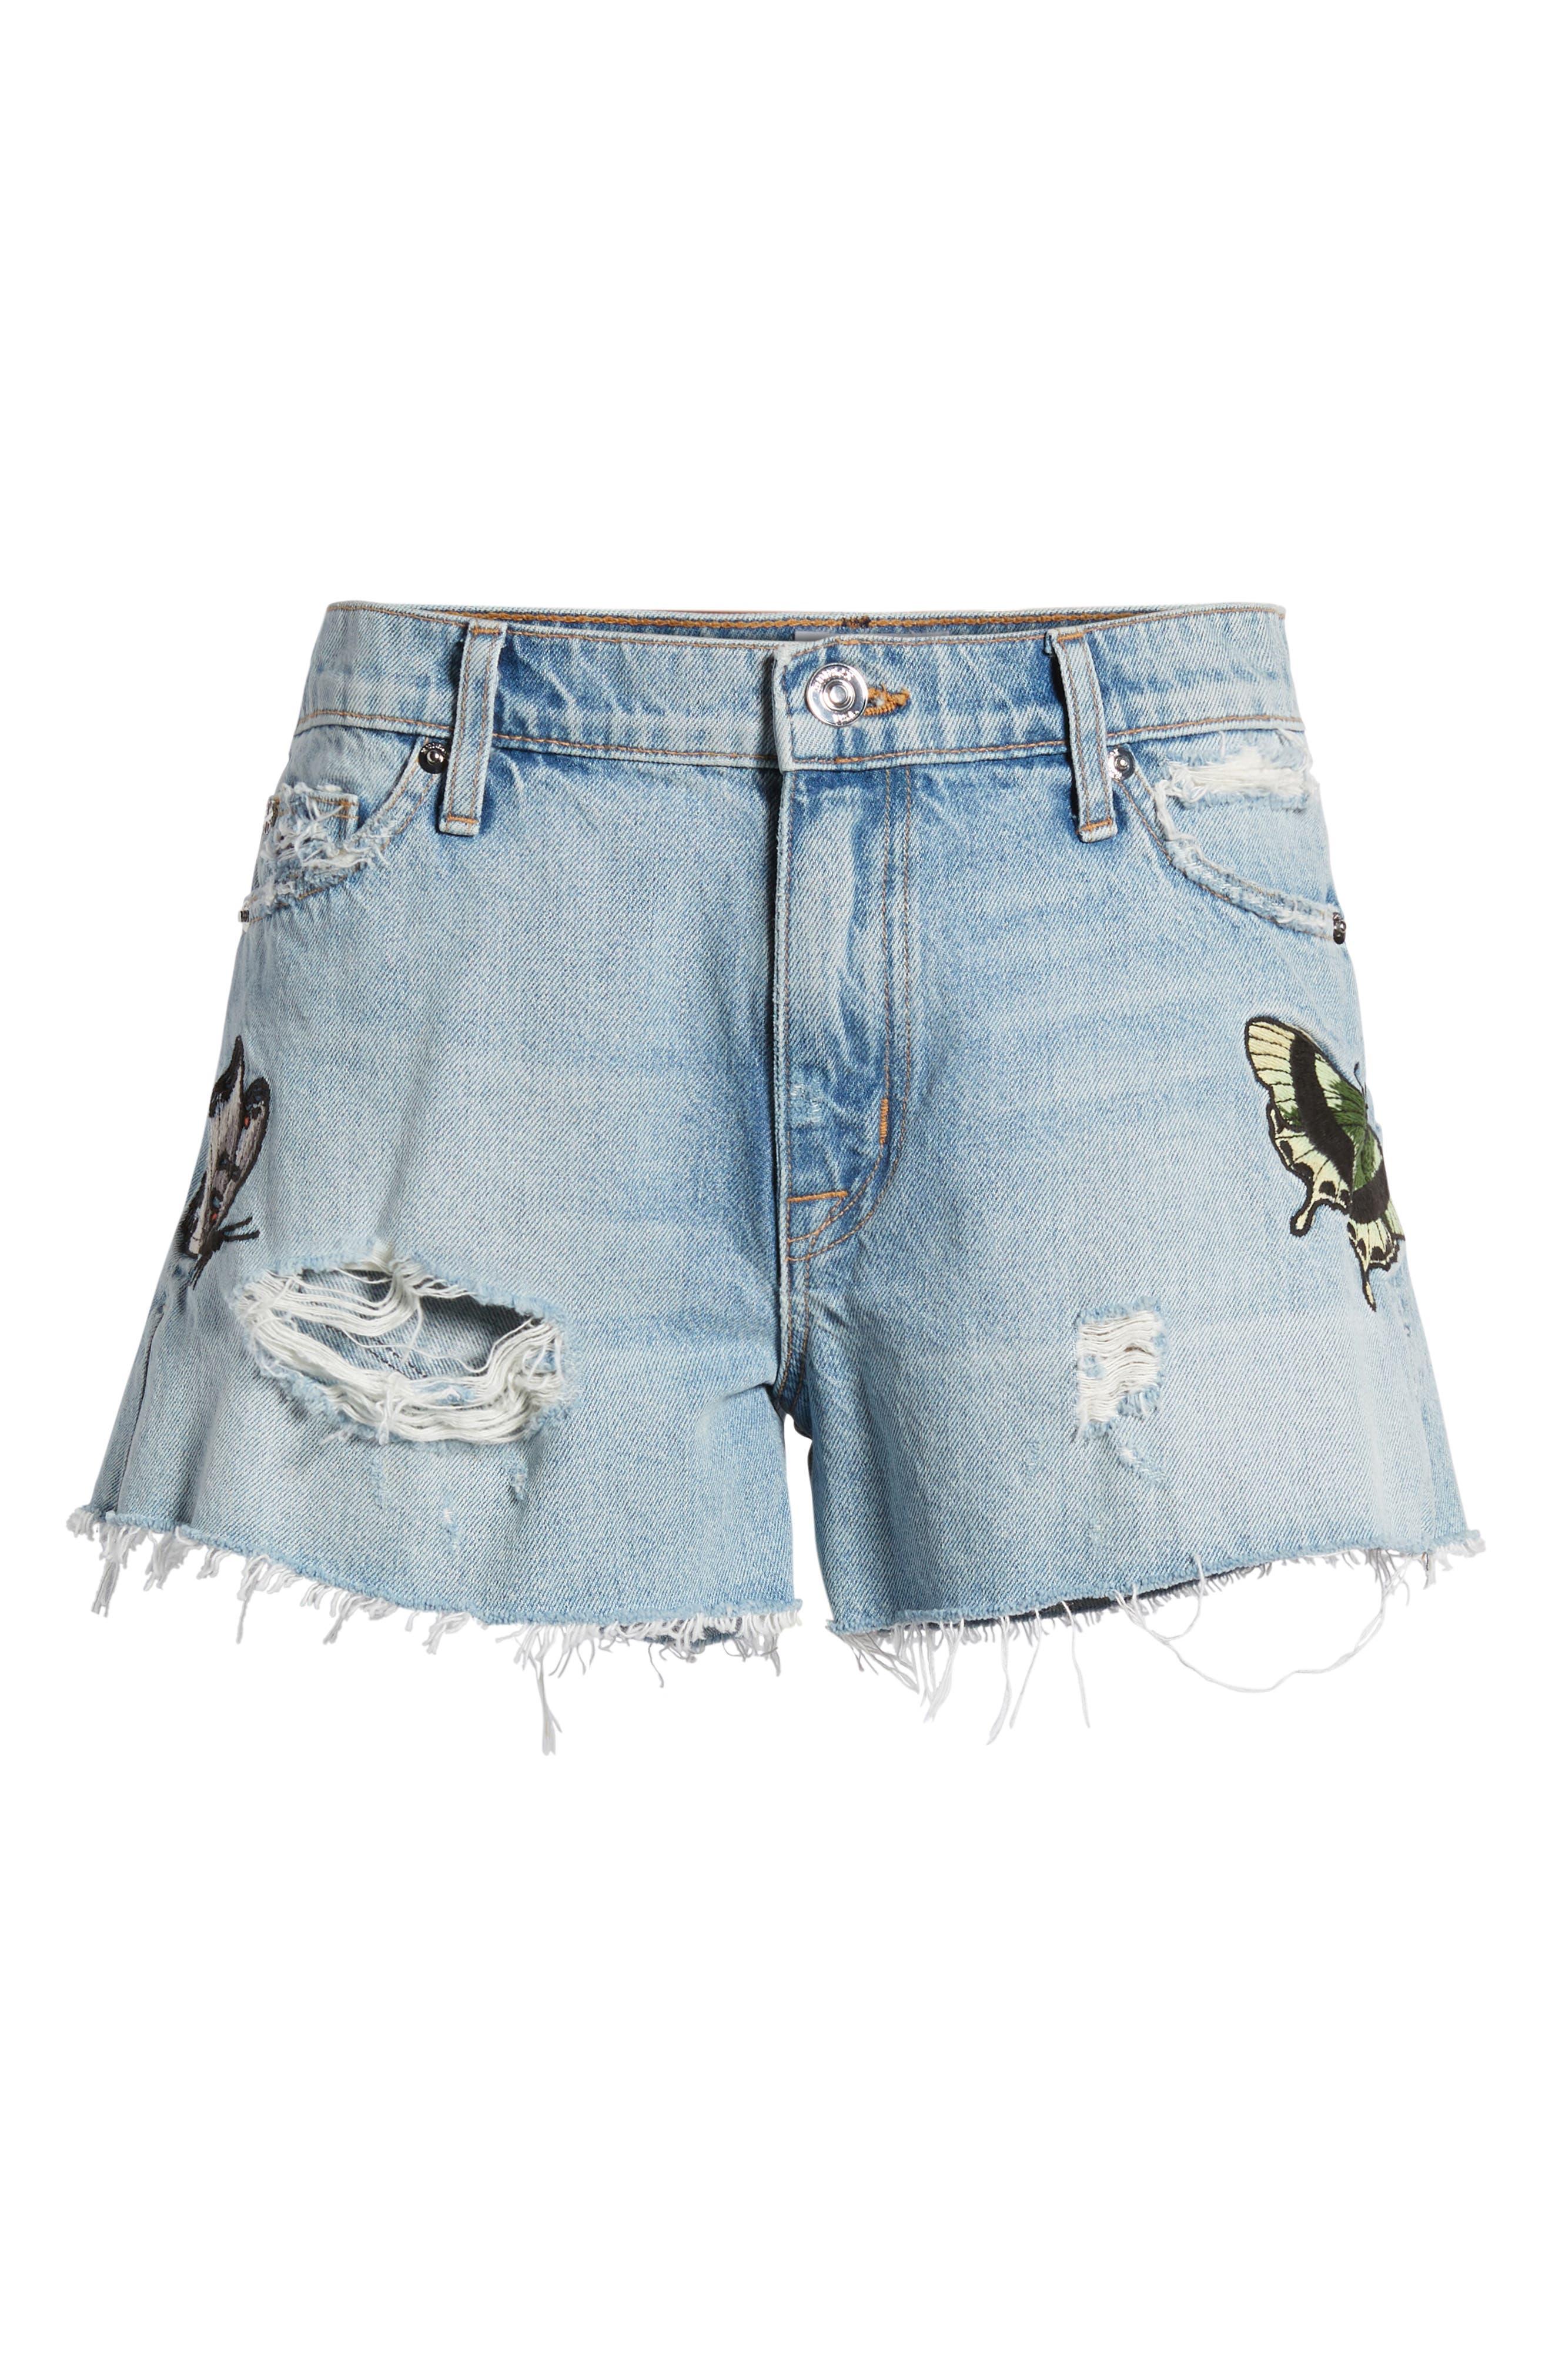 Sade Cutoff Denim Shorts,                             Alternate thumbnail 7, color,                             Monarch